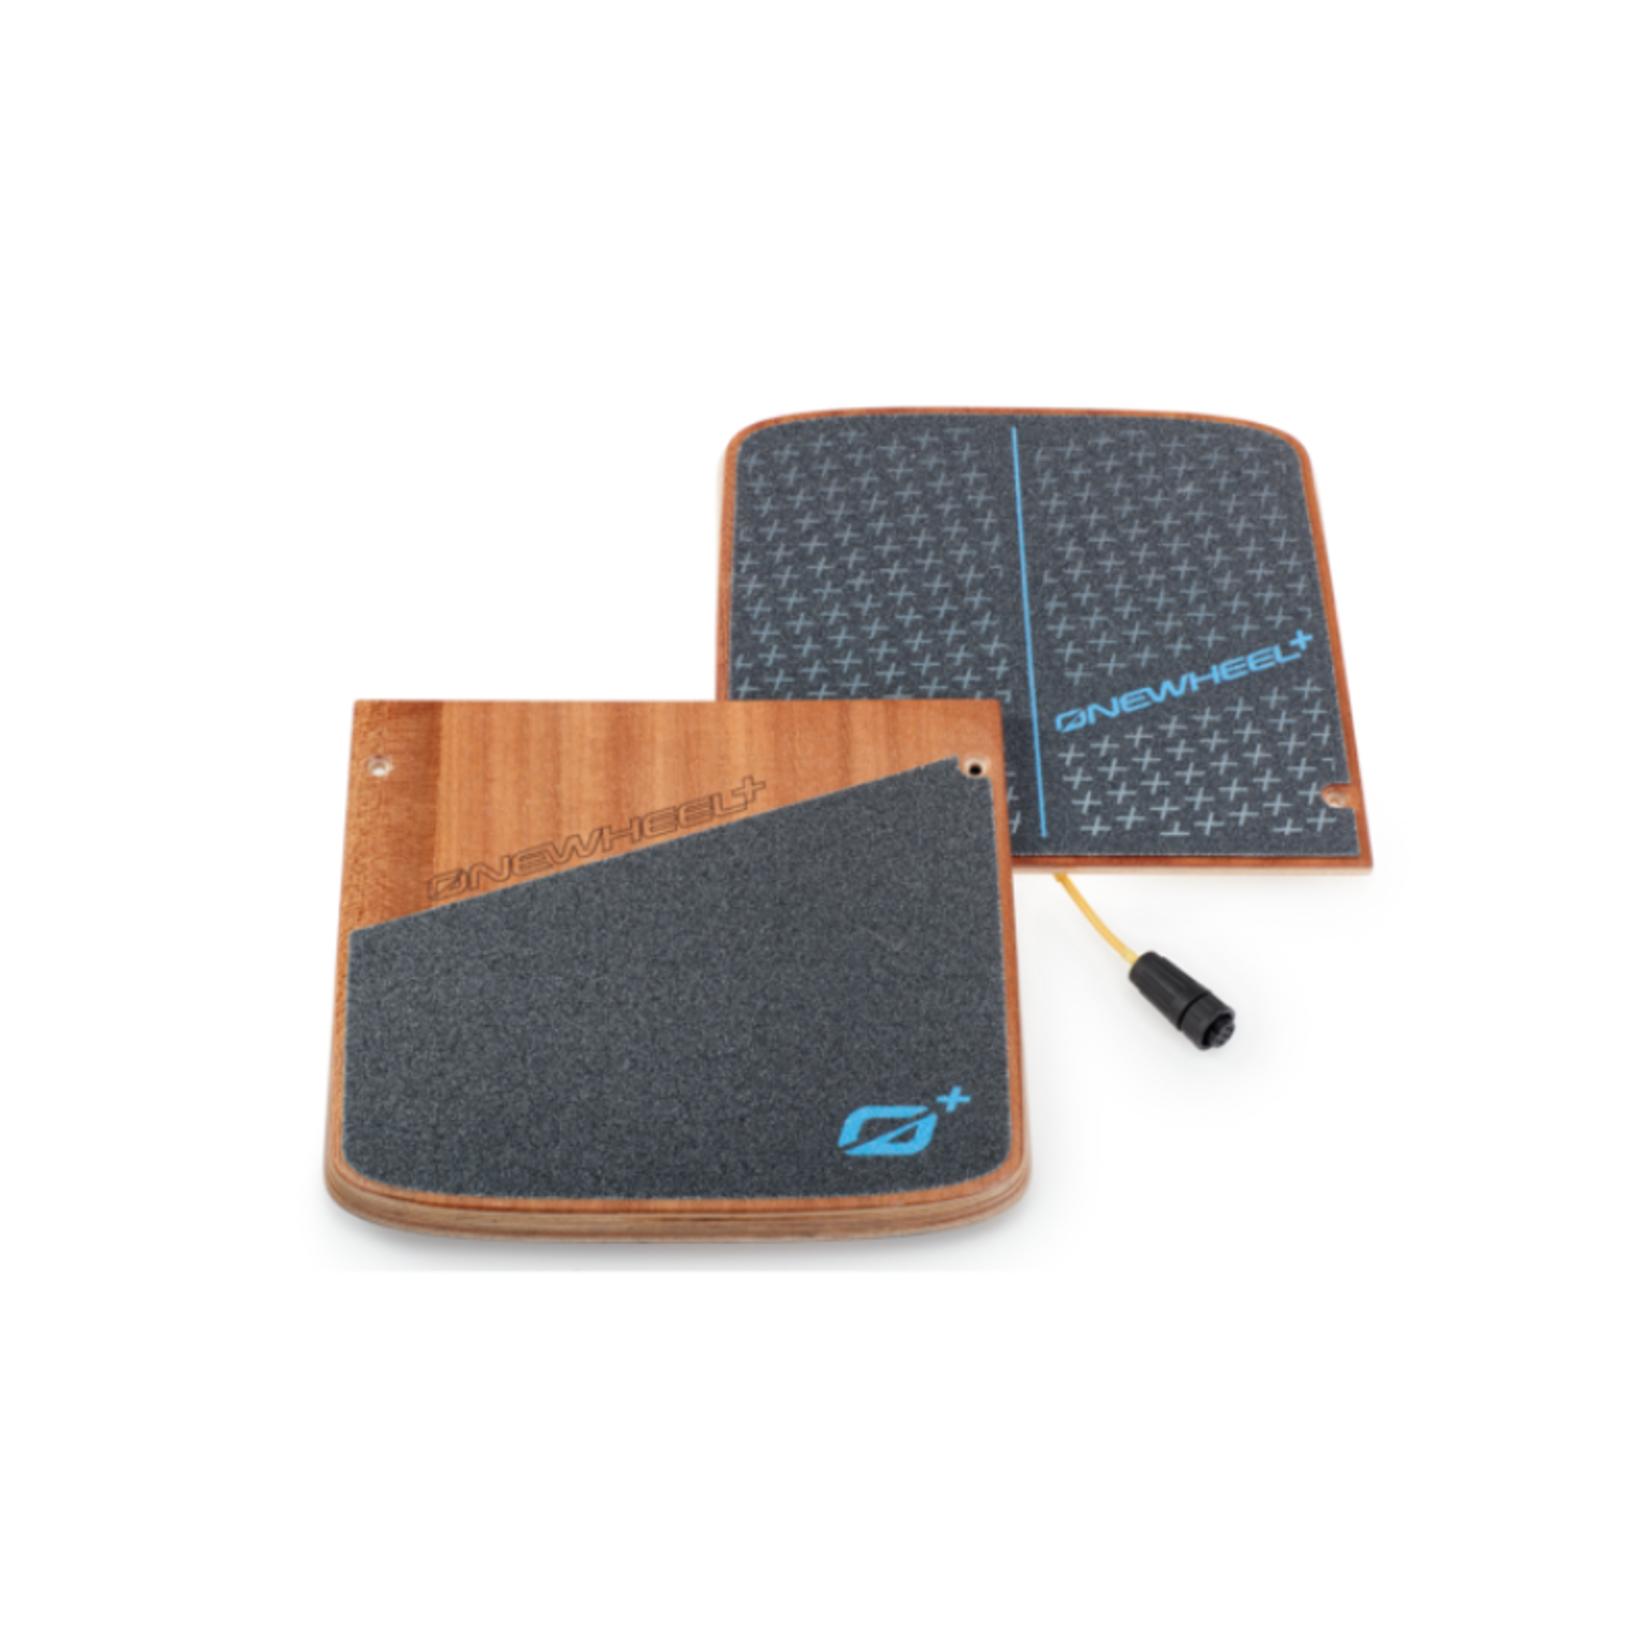 Onewheel Onewheel XR Surestance Footpad